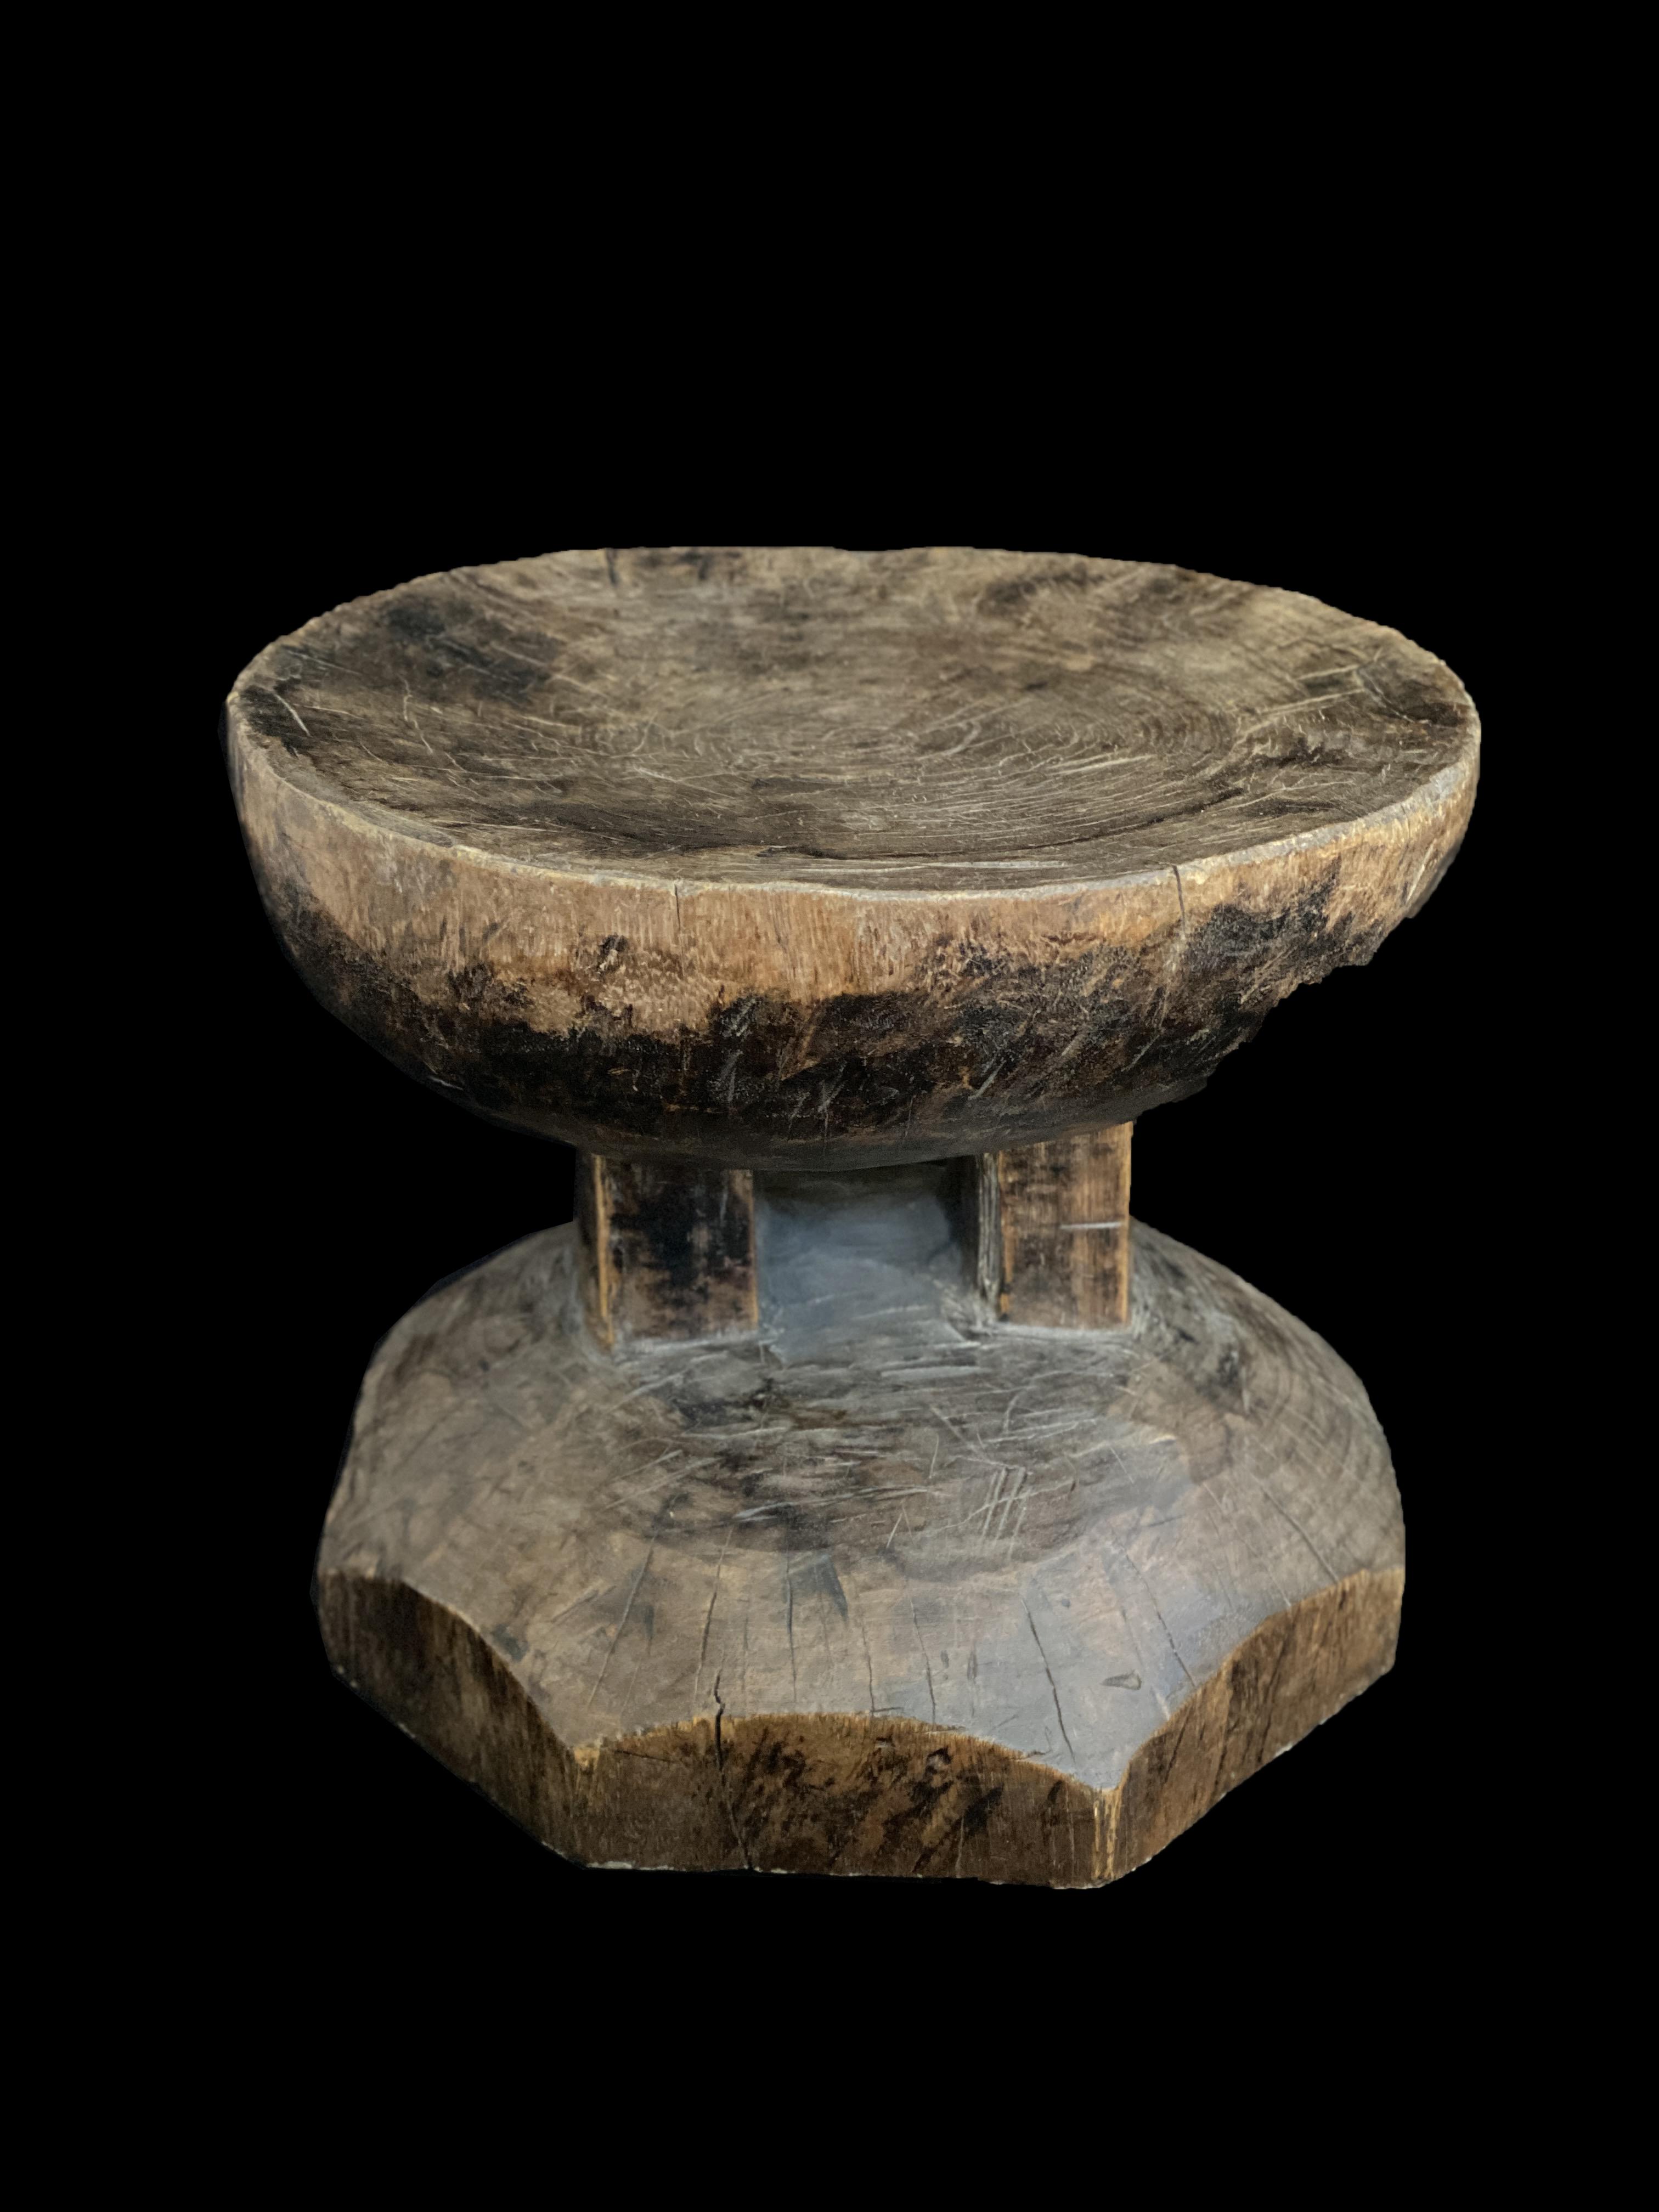 Wooden Stool with Scalloped Base - Lozi People, Zambia